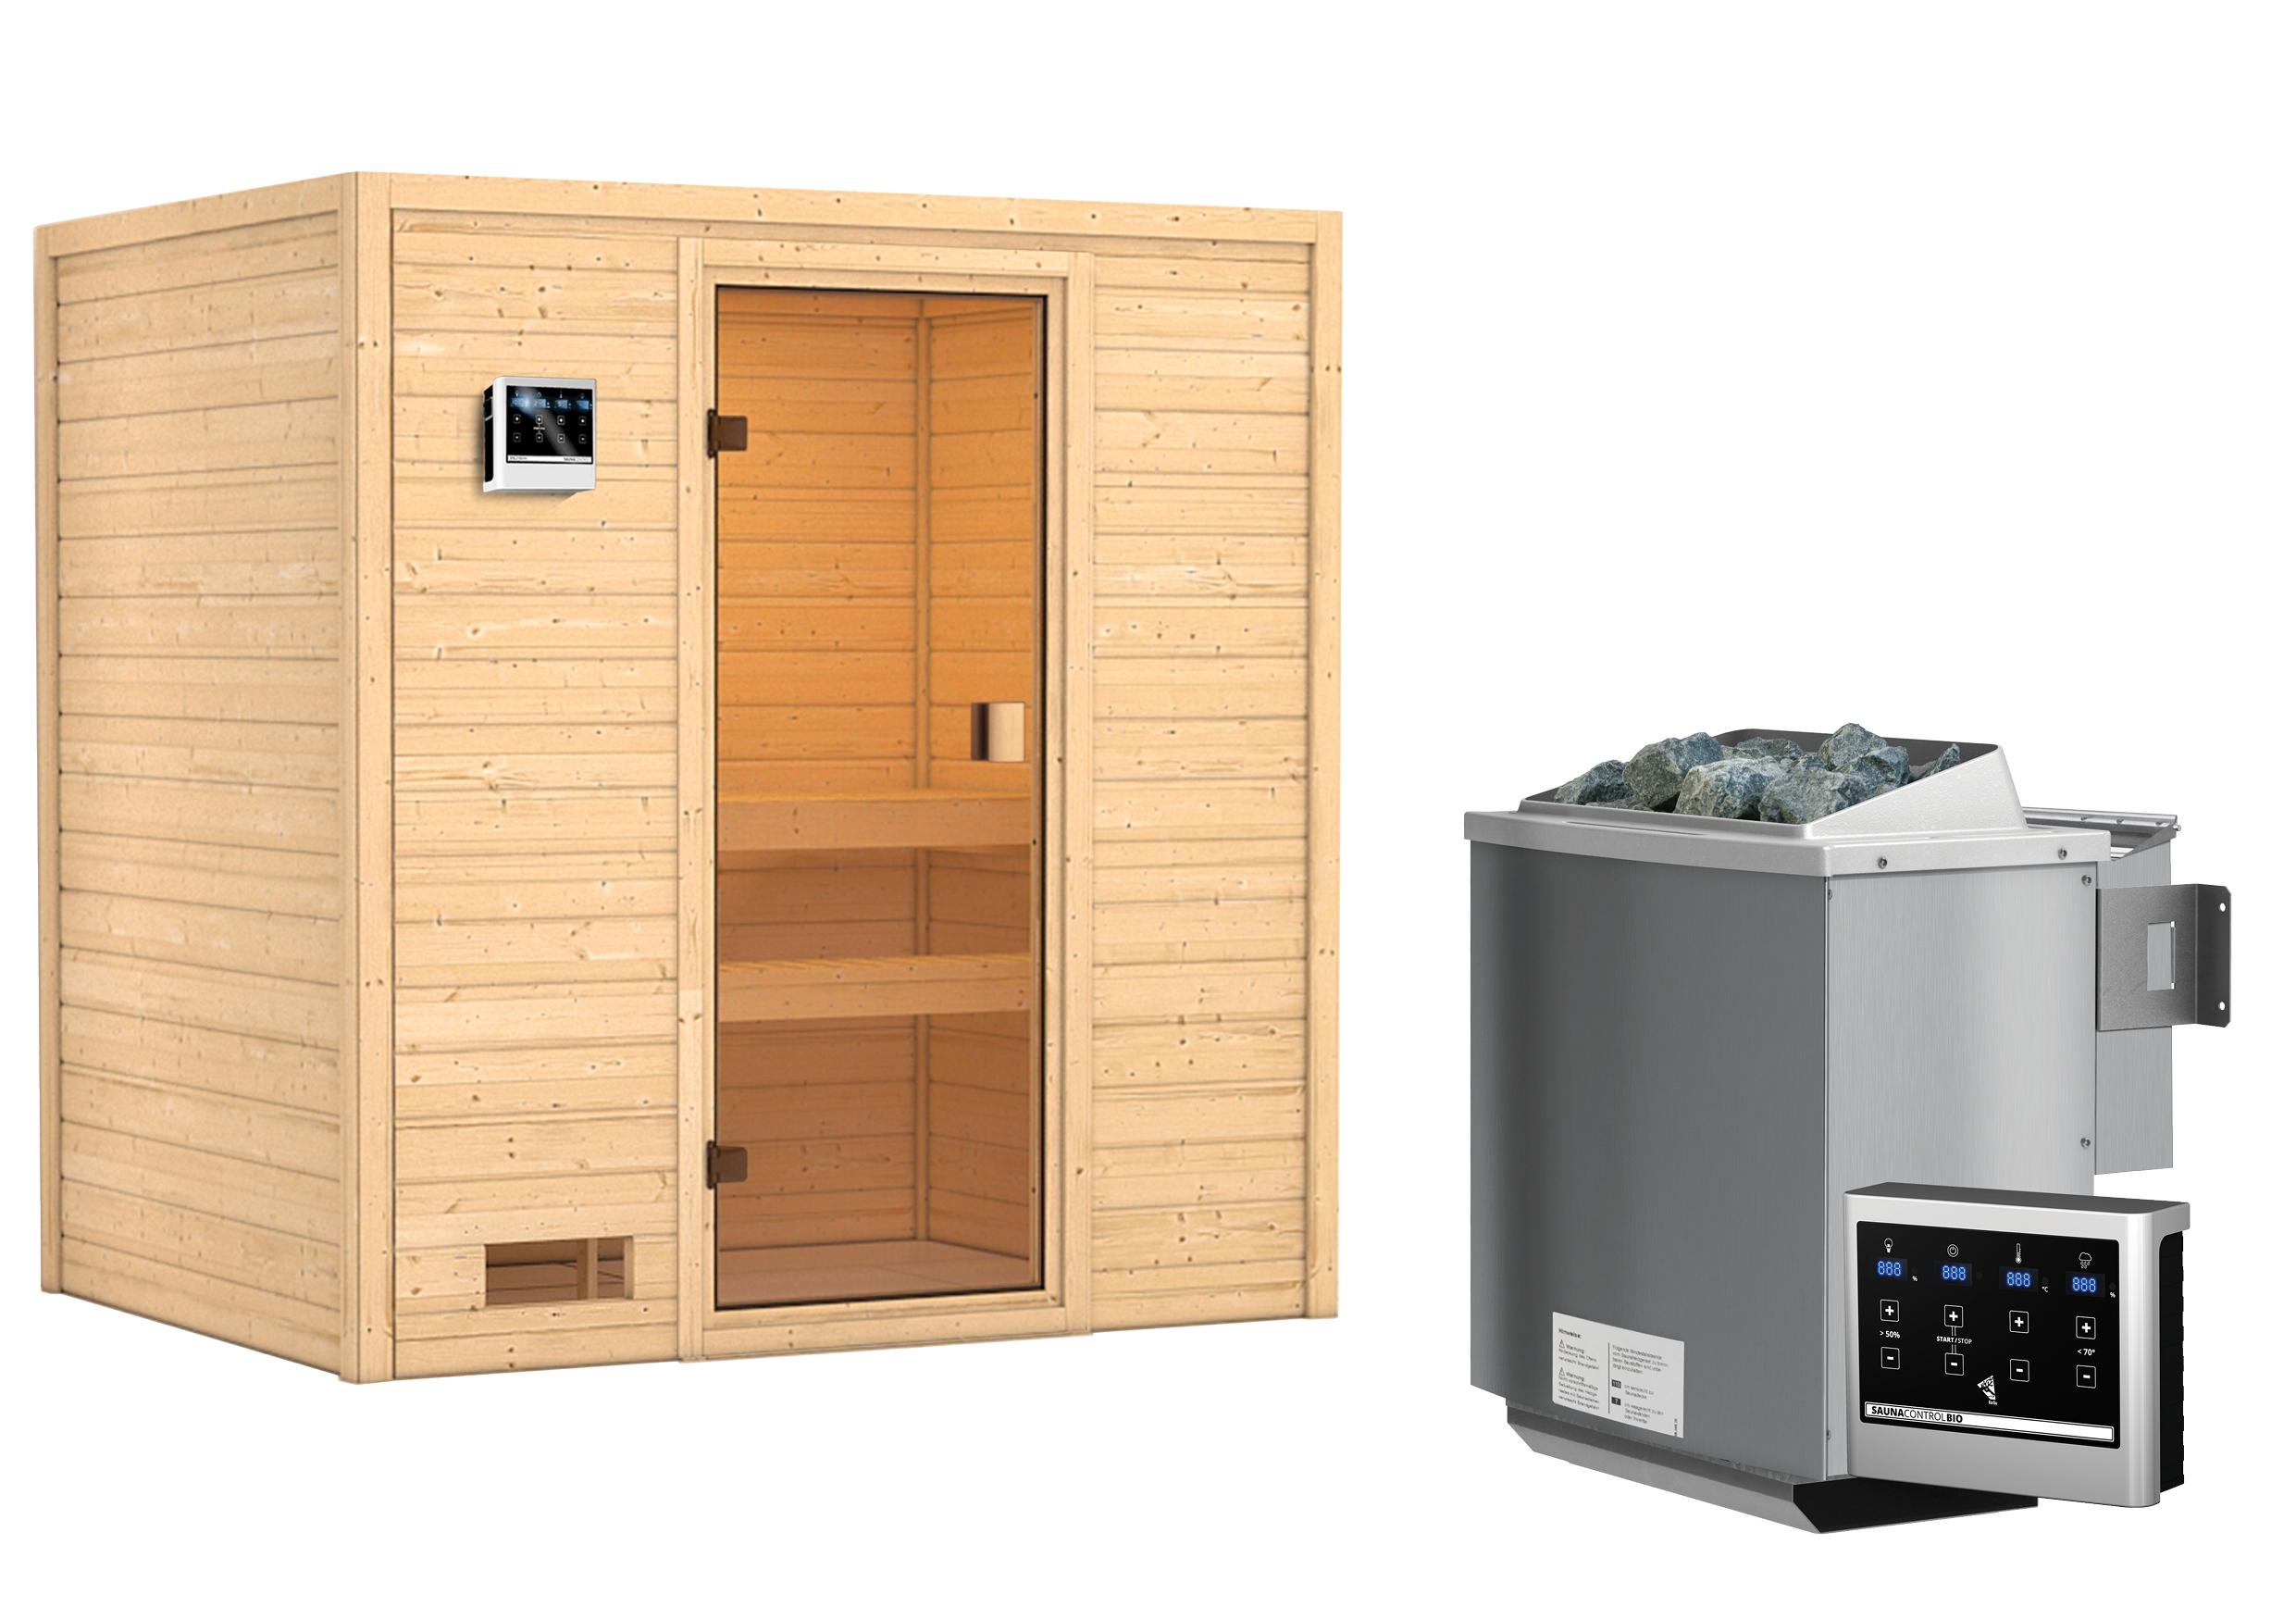 Woodfeeling Sauna Selena 38mm Bio Saunaofen 9 kW extern Bild 6